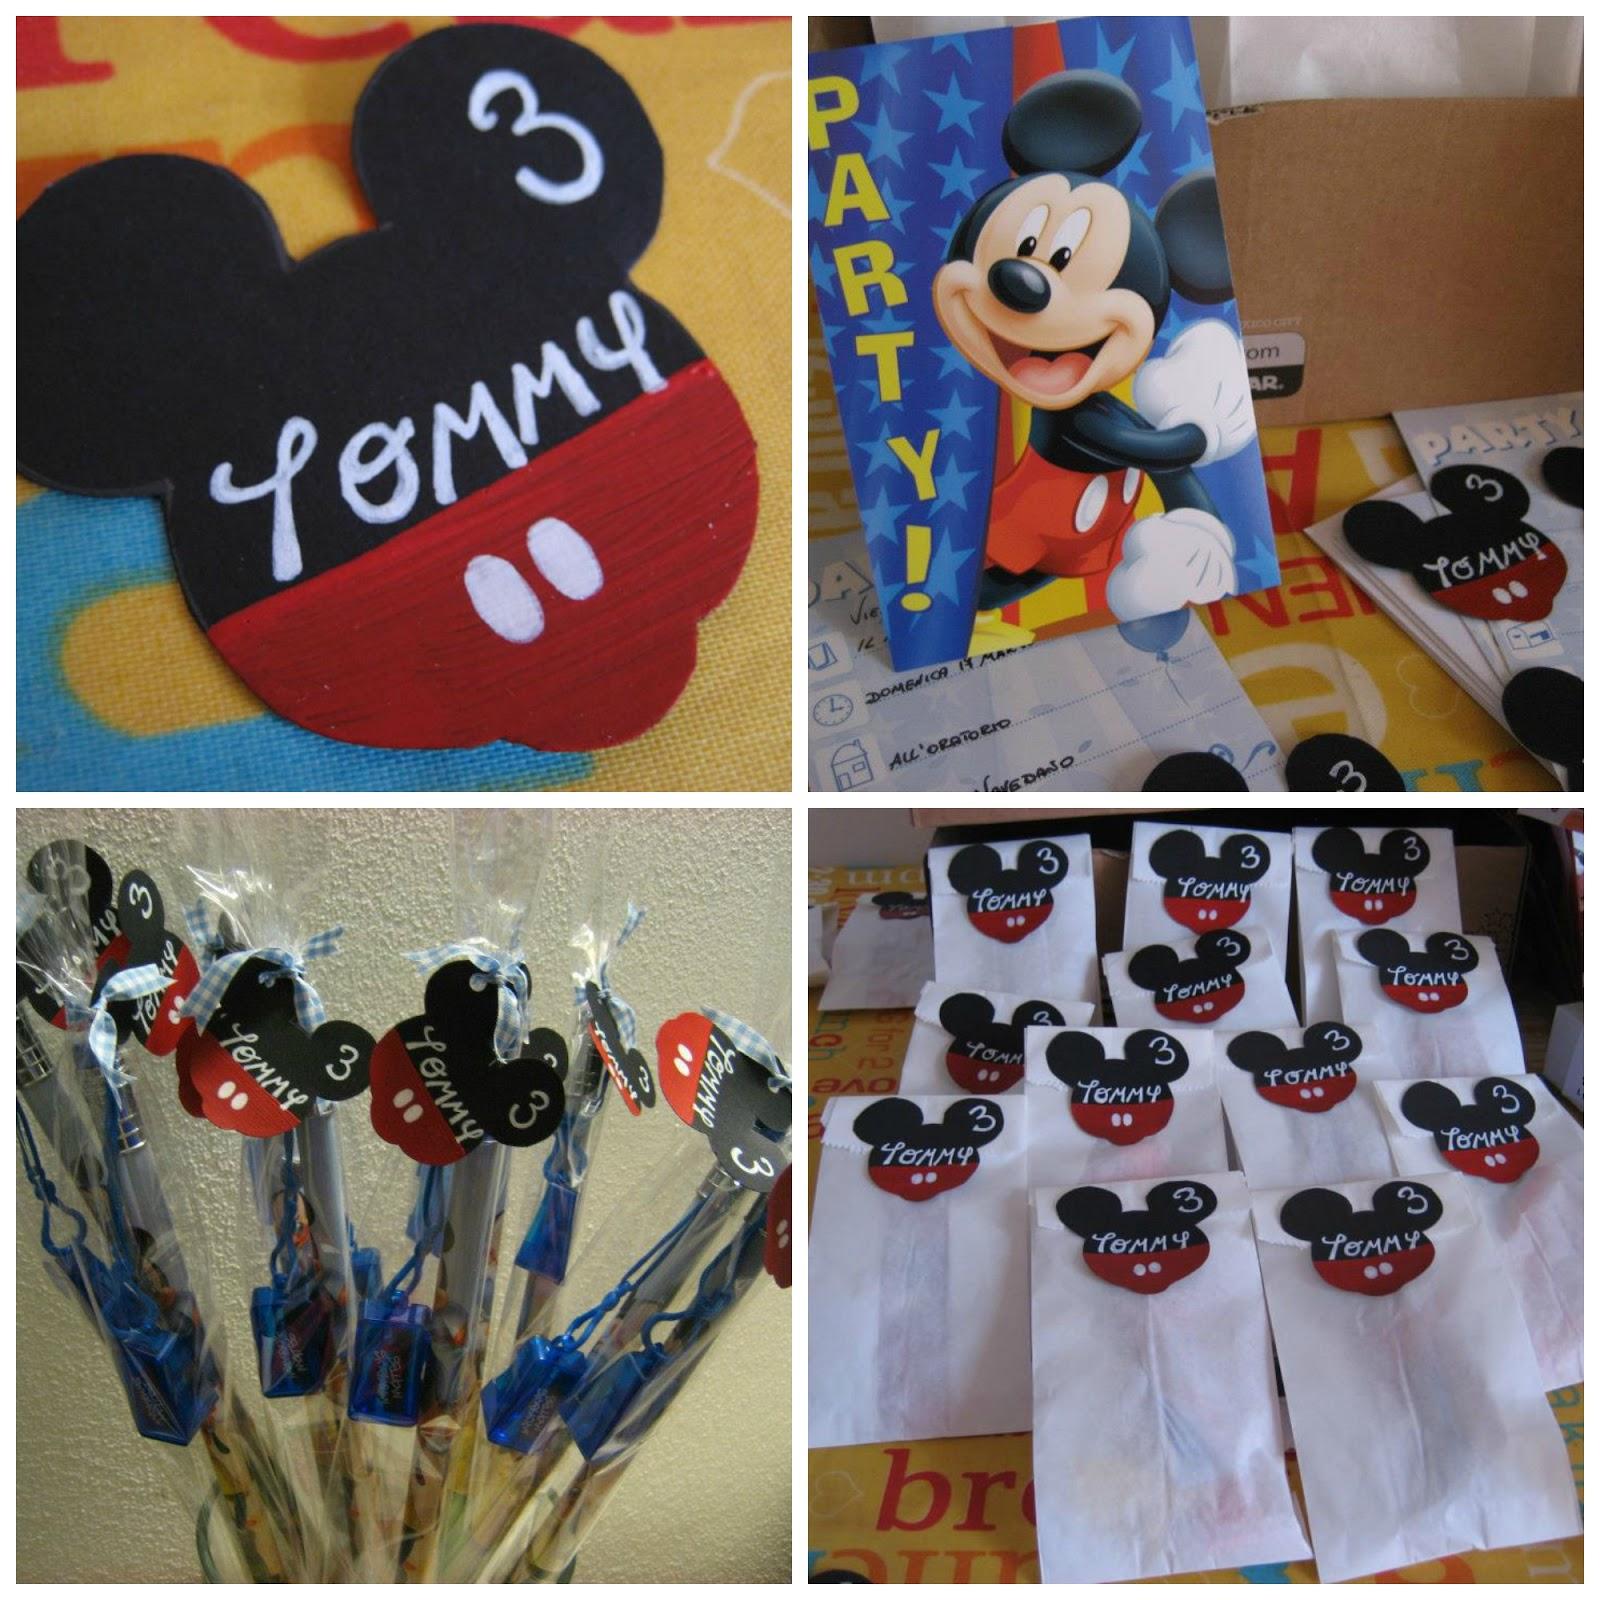 Top Pasticciando in cucina: Michey Mouse Partyper il 3°compleanno  OO46